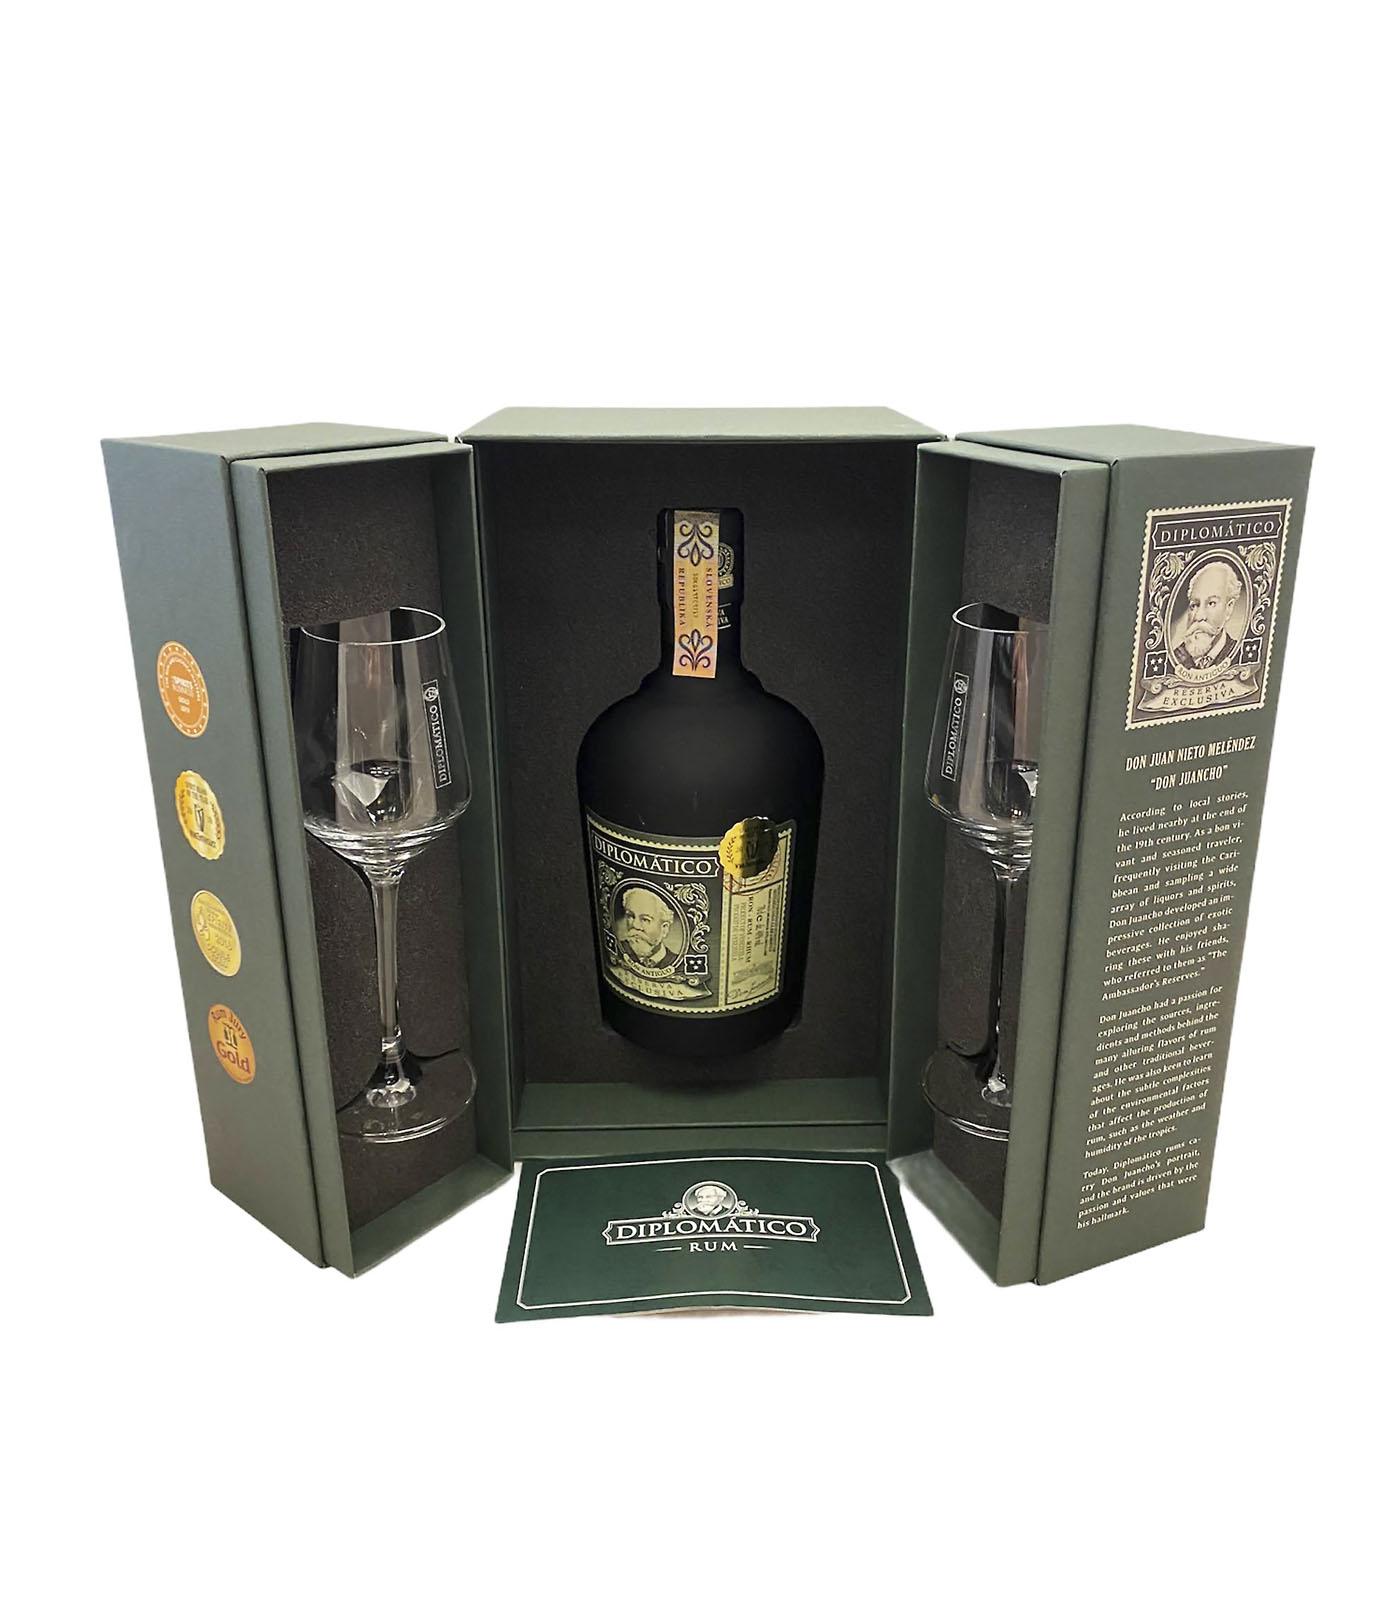 Diplomático Reserva Exclusiva 12 YO Ritual Set, 40 %, 0,7 L GIFT, Bottleshop Sunny wines slnecnice mesto, petrzalka, rum, rozvoz alkoholu, eshop